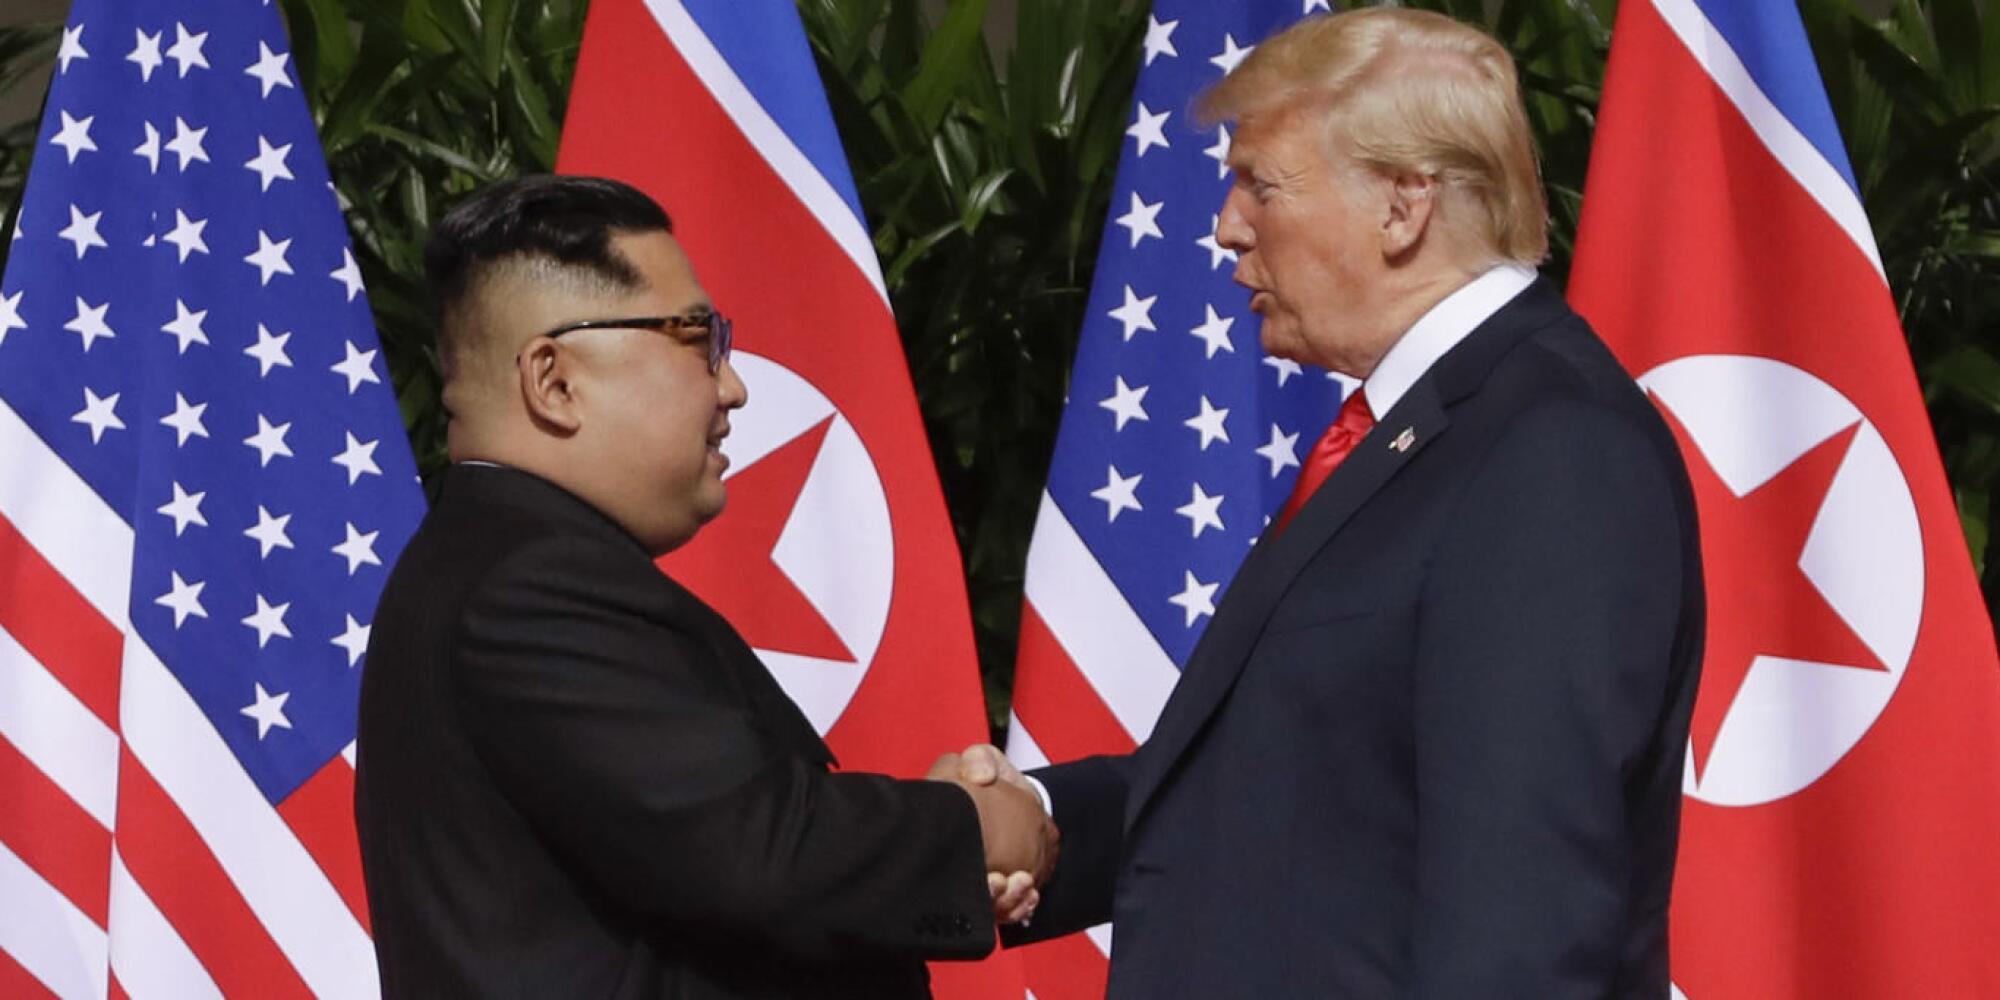 Singapore summit: Historic meeting between President Trump and North Korea's Kim Jong Un